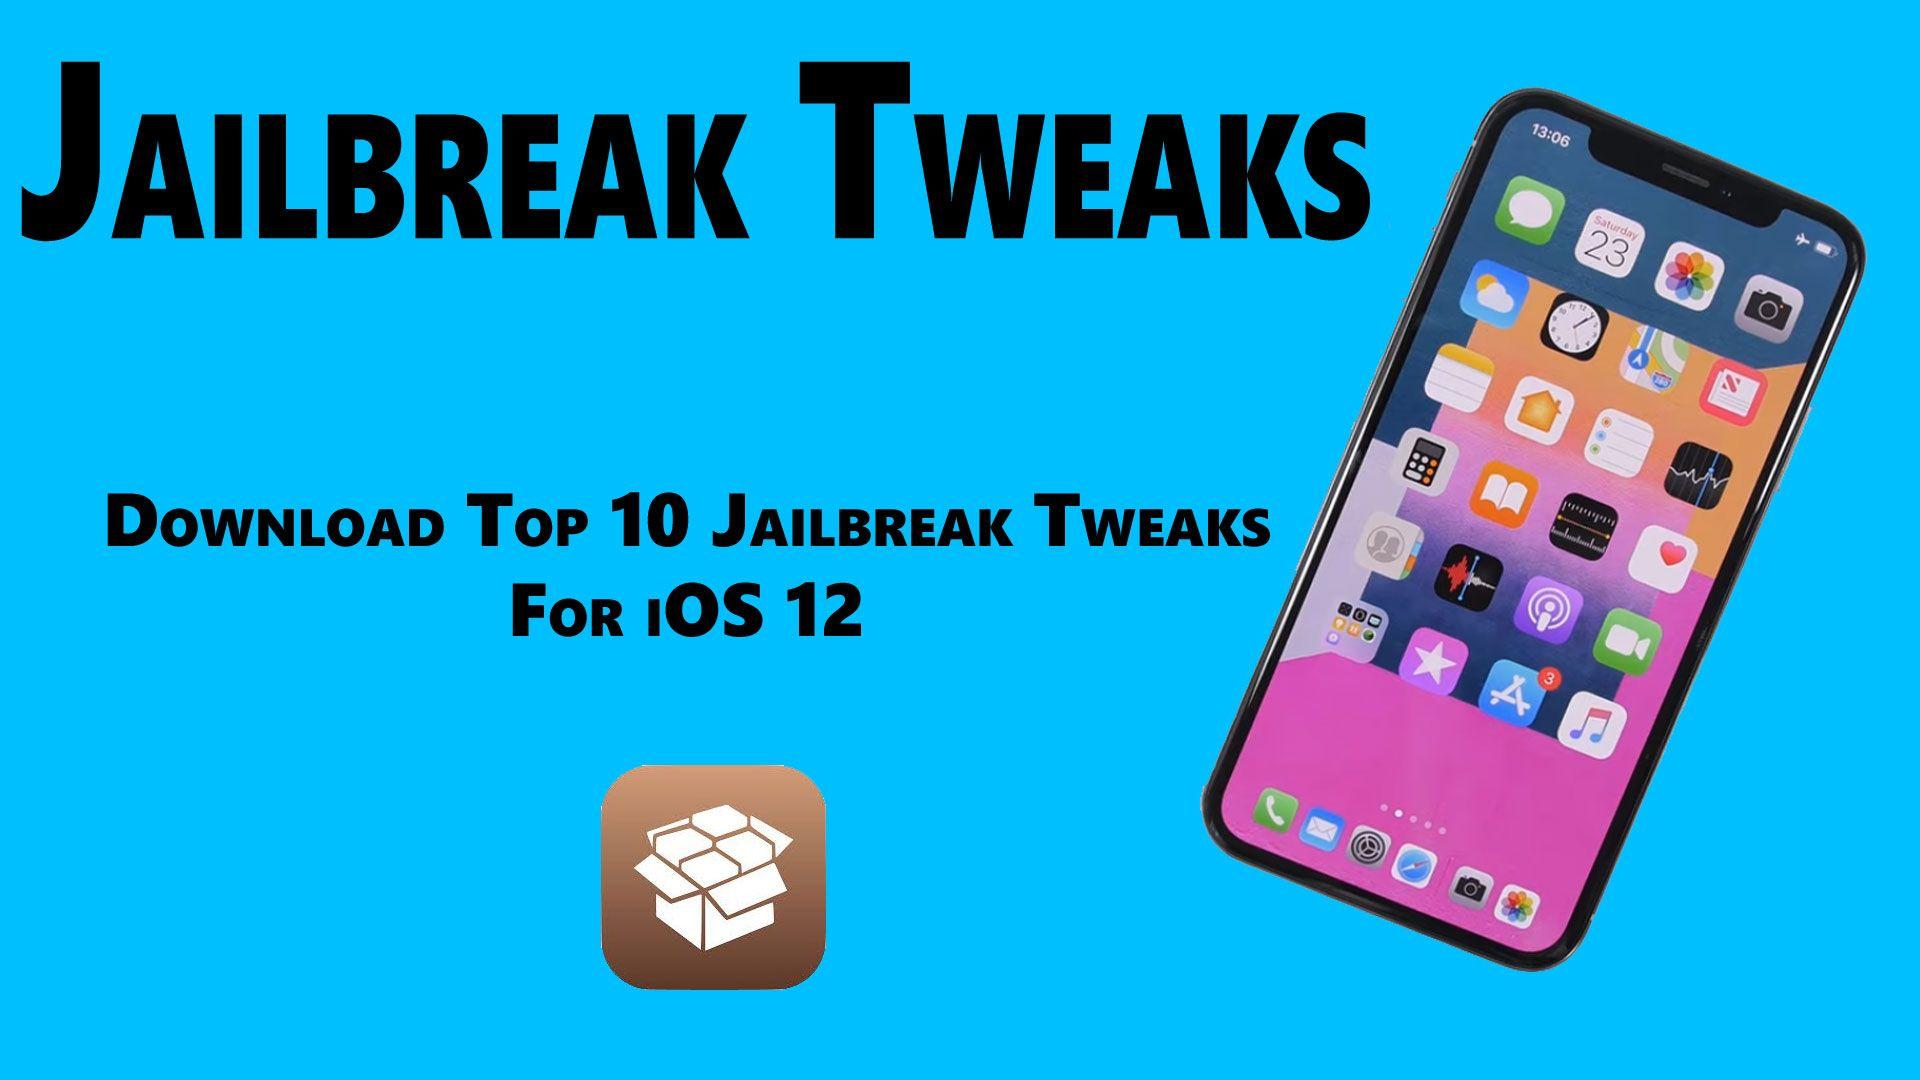 Jailbreak Tweaks For Ios 12 Iphone Imessage App Messaging App